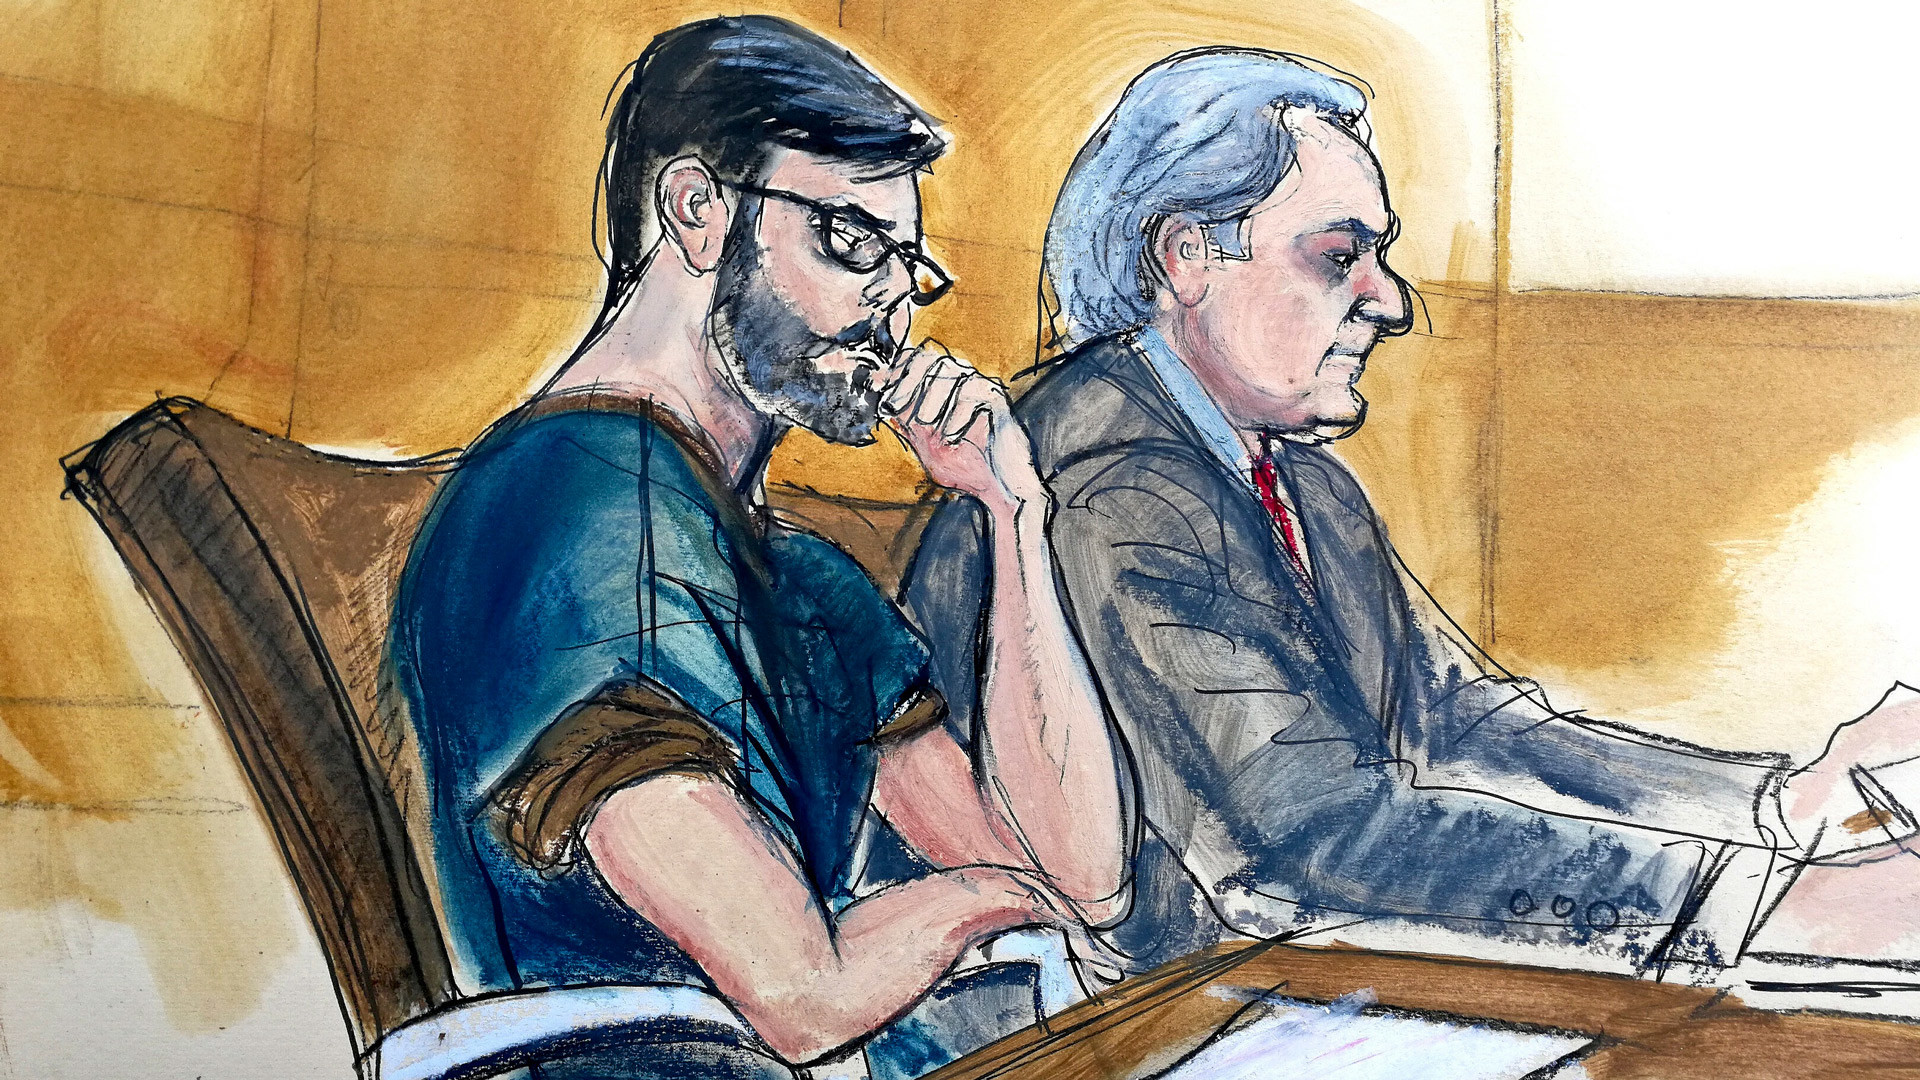 Эскиз из зала суда. Фото: © Elizabeth Williams via AP